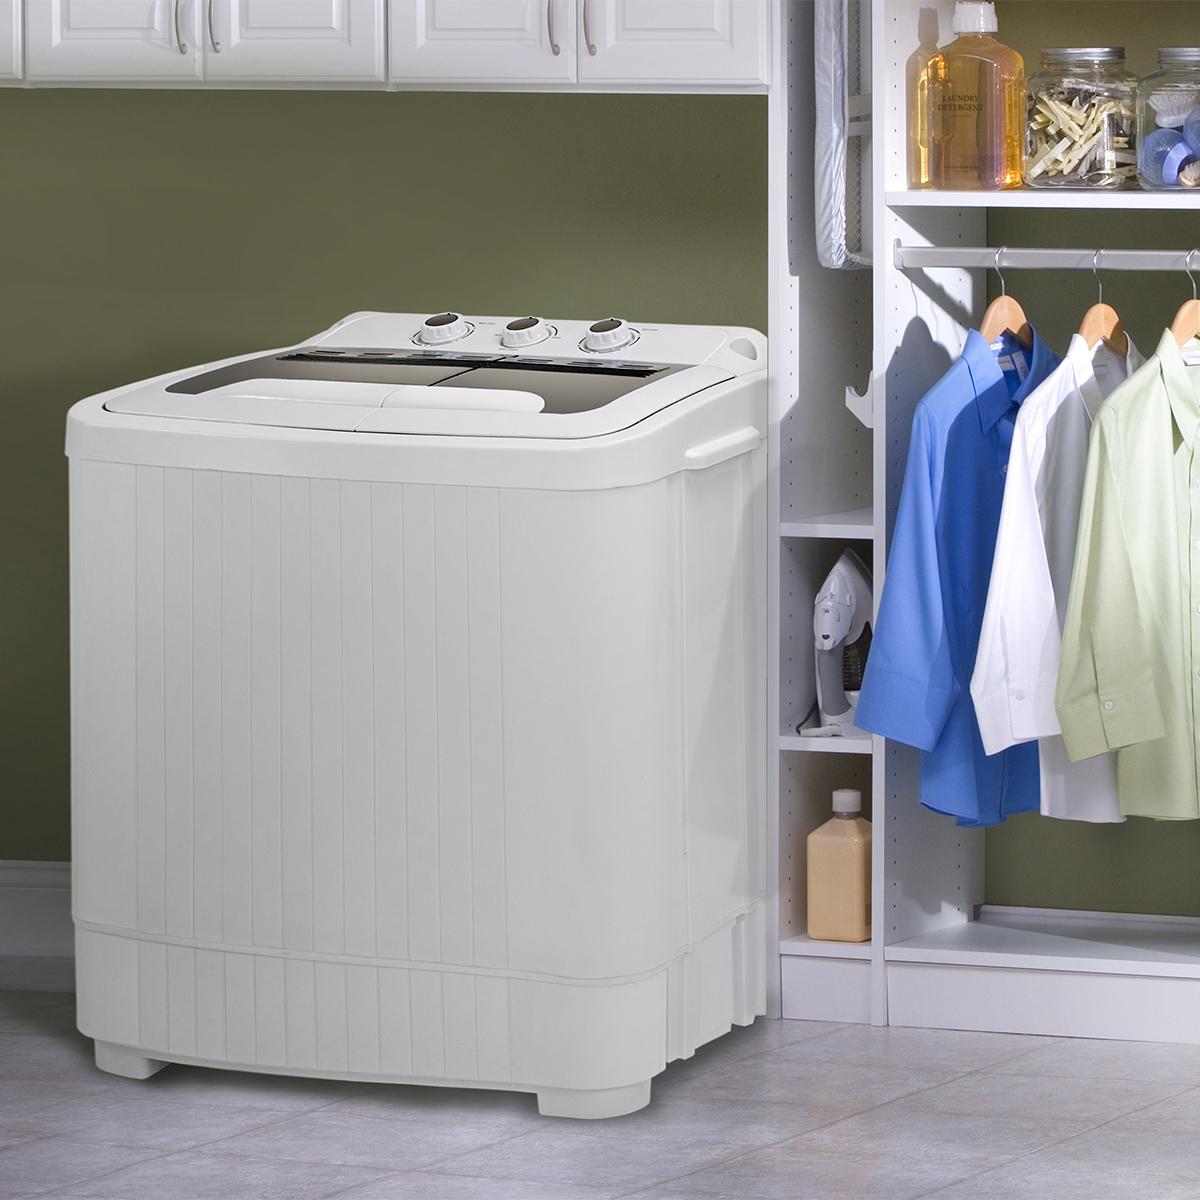 VIVOHOME Portable Mini Compact Twin Tub Washing Machine Washer Spin /&Dryer 13lbs